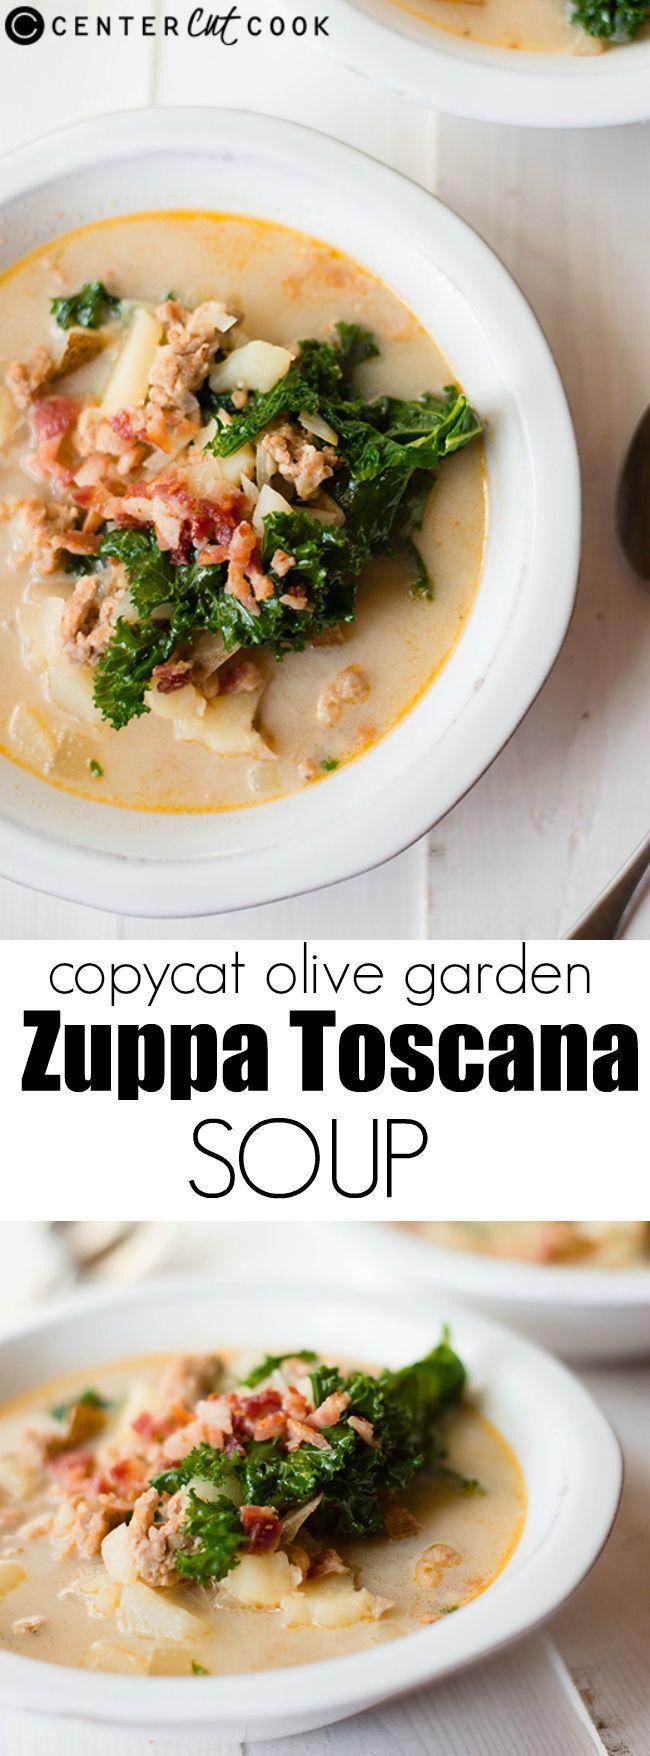 1000 images about centercutcook on pinterest peanut - Olive garden zuppa toscana copycat ...